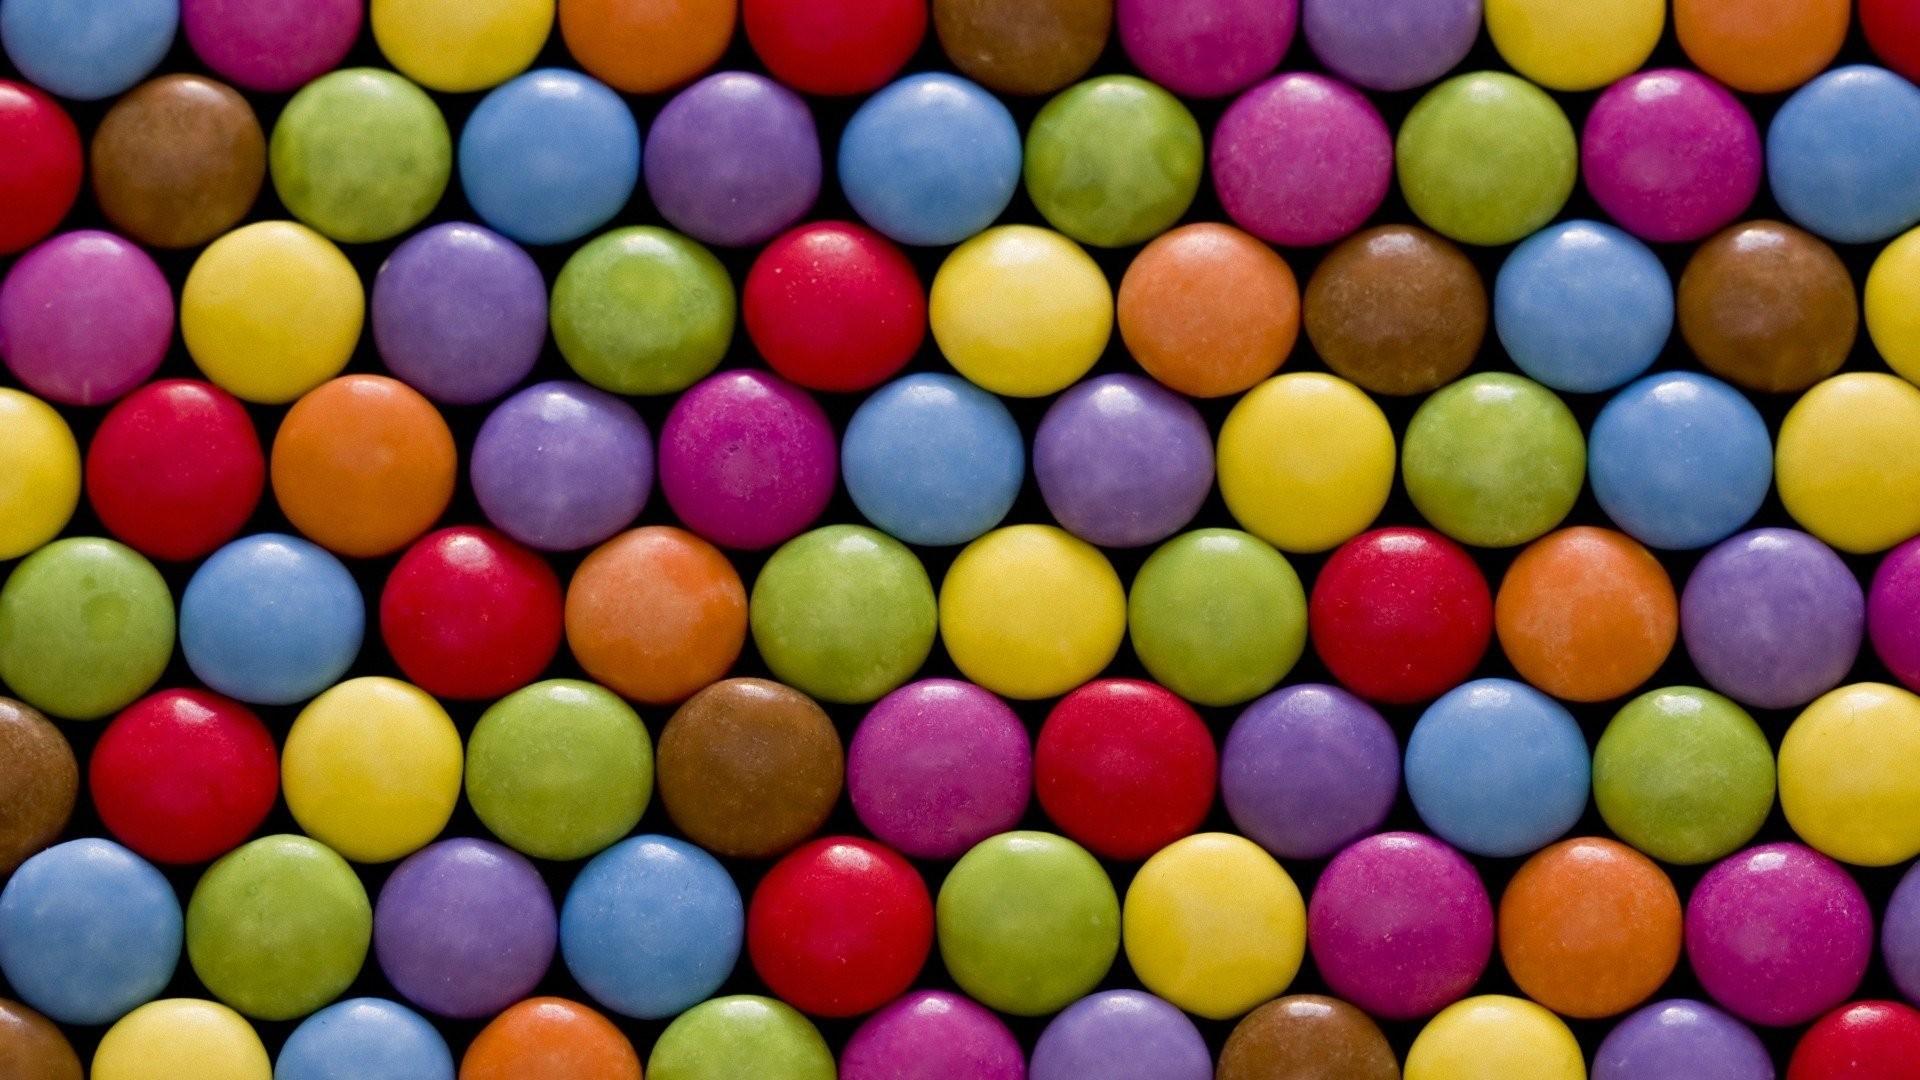 Skittles full screen hd wallpaper